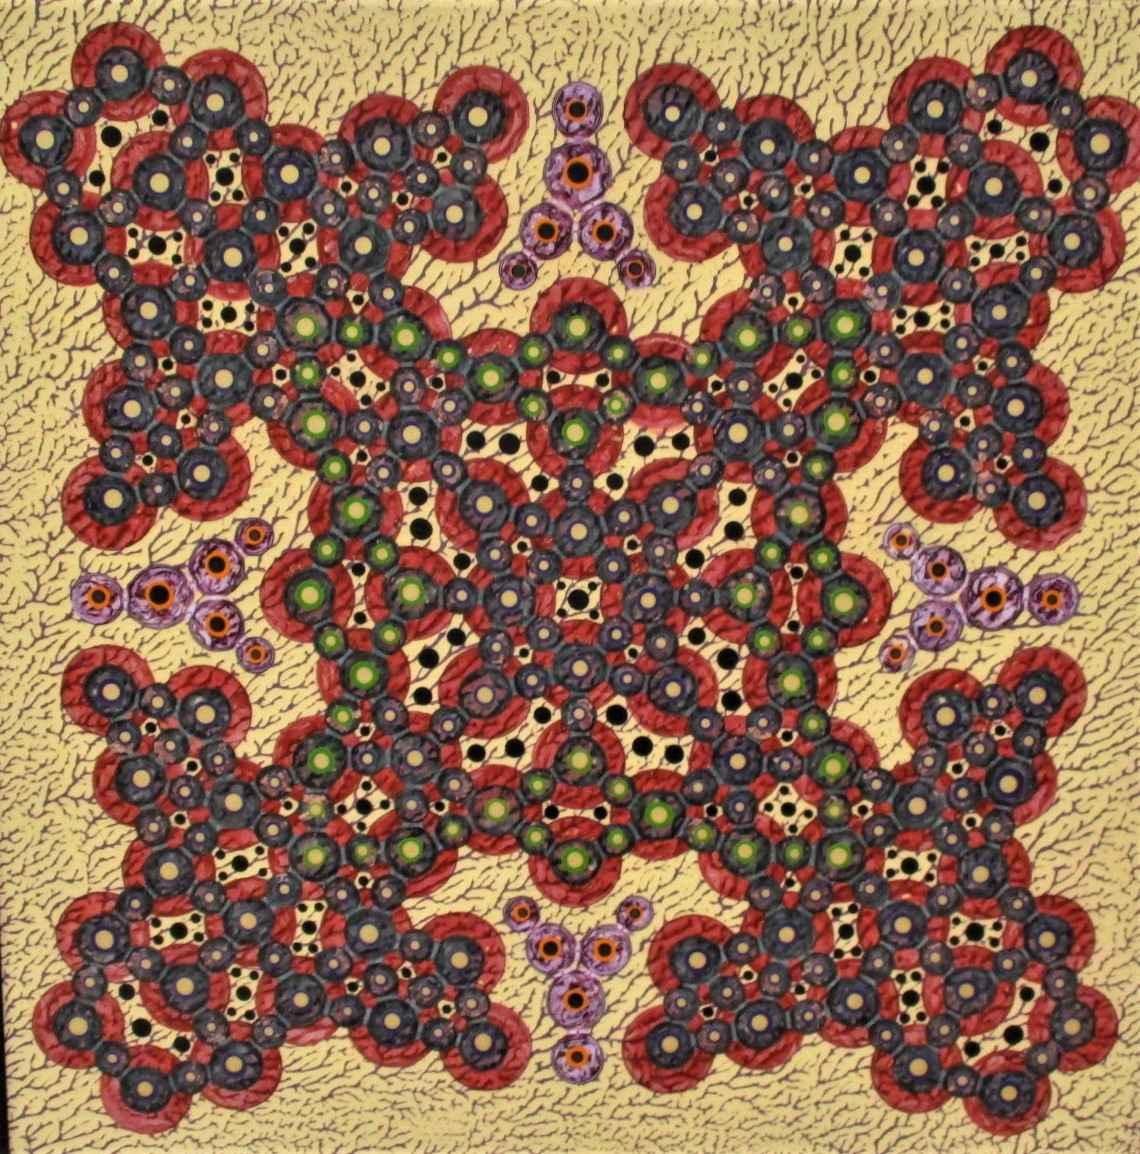 Untitled #035 by  John Redman - Masterpiece Online